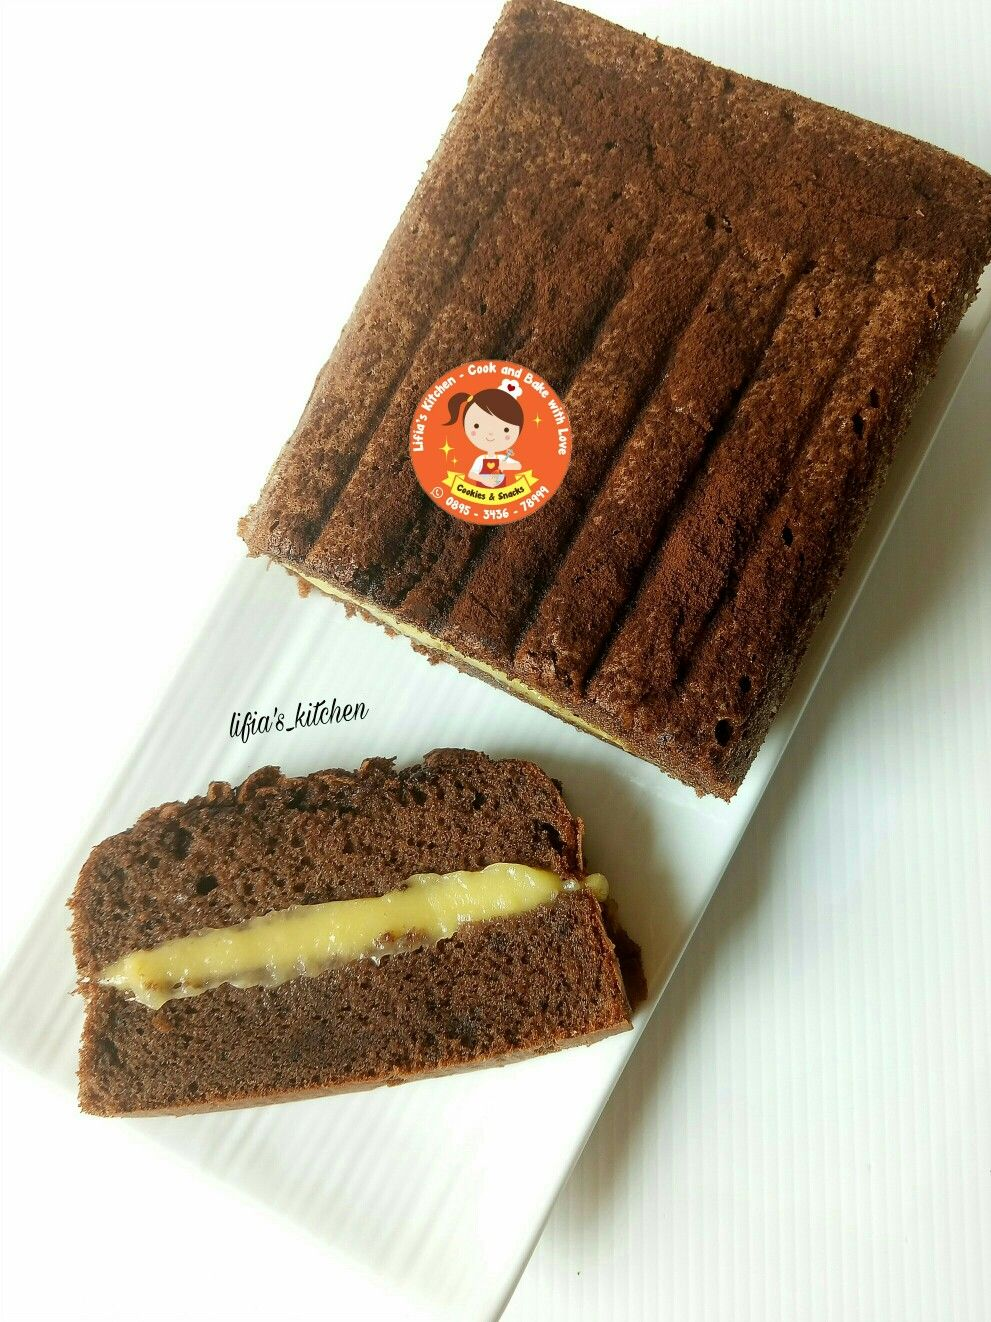 Gateau African Cake Coklat Lapis Vla Gateauafrican Gateauafricancakecoklatlapisvla Cakecoklatlapisvla Cakecoklat Lapisvla Vla Resep Kue Kue Kue Coklat